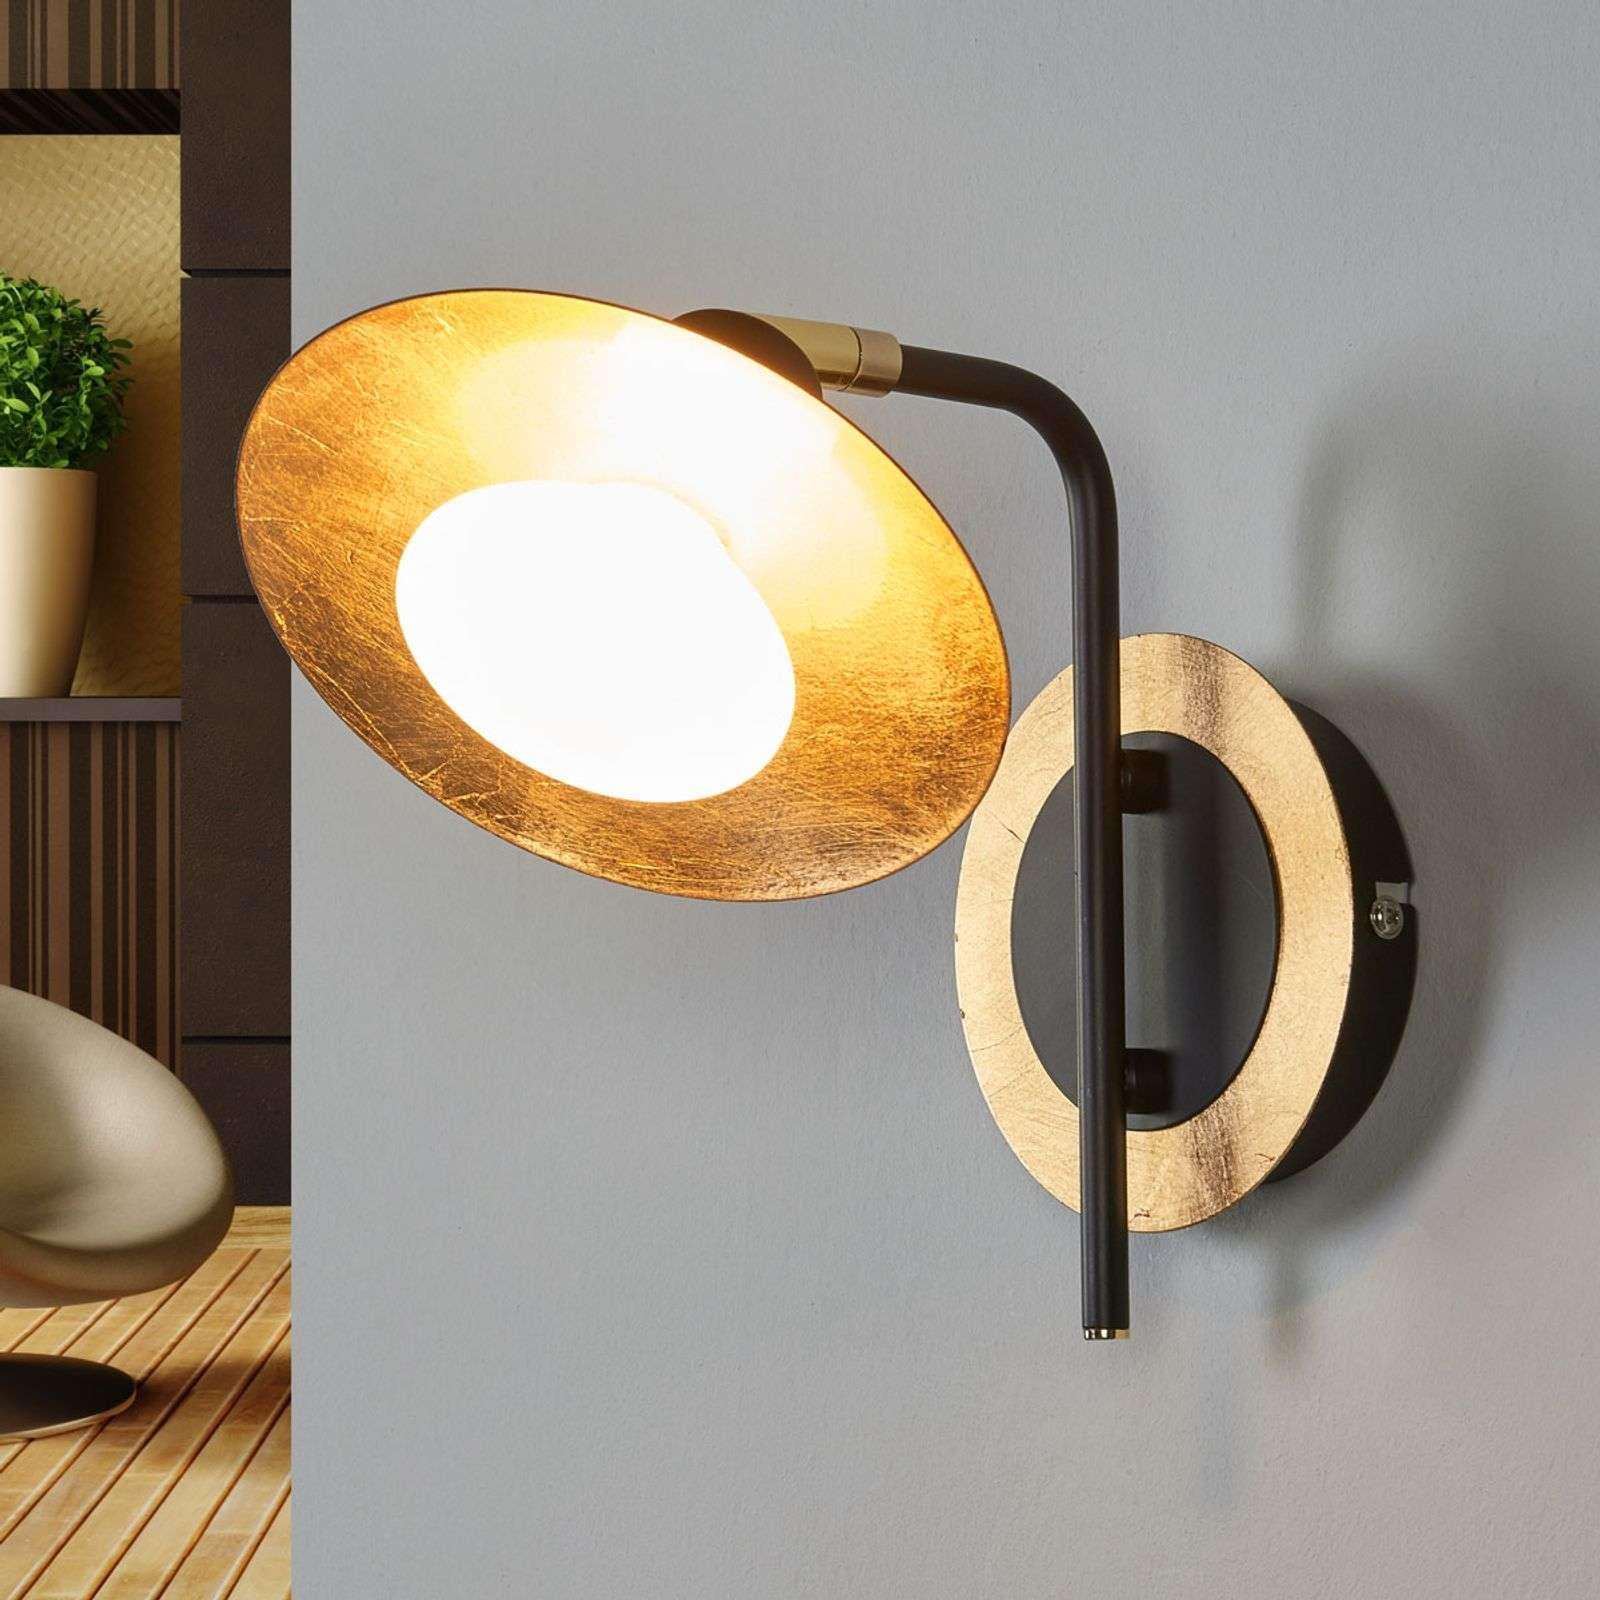 Lampenwelt.com Applique LED noire-dorée Andrej - LAMPENWELT.com